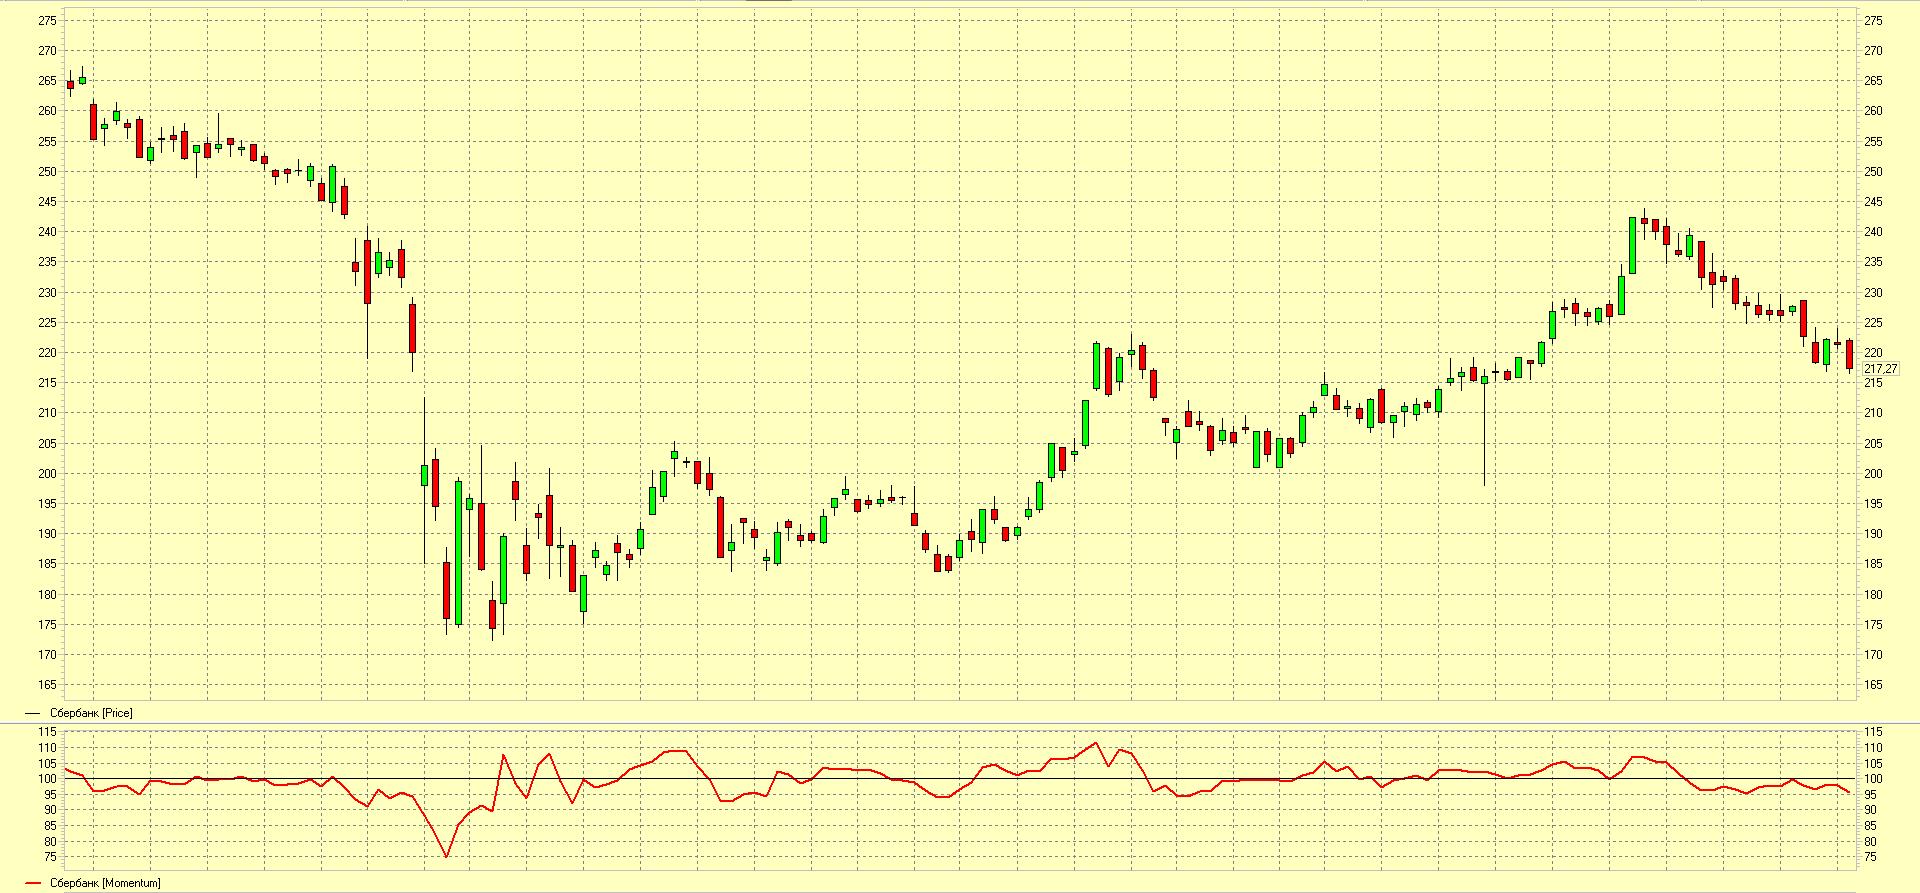 индикатор momentum на графике Сбербанка